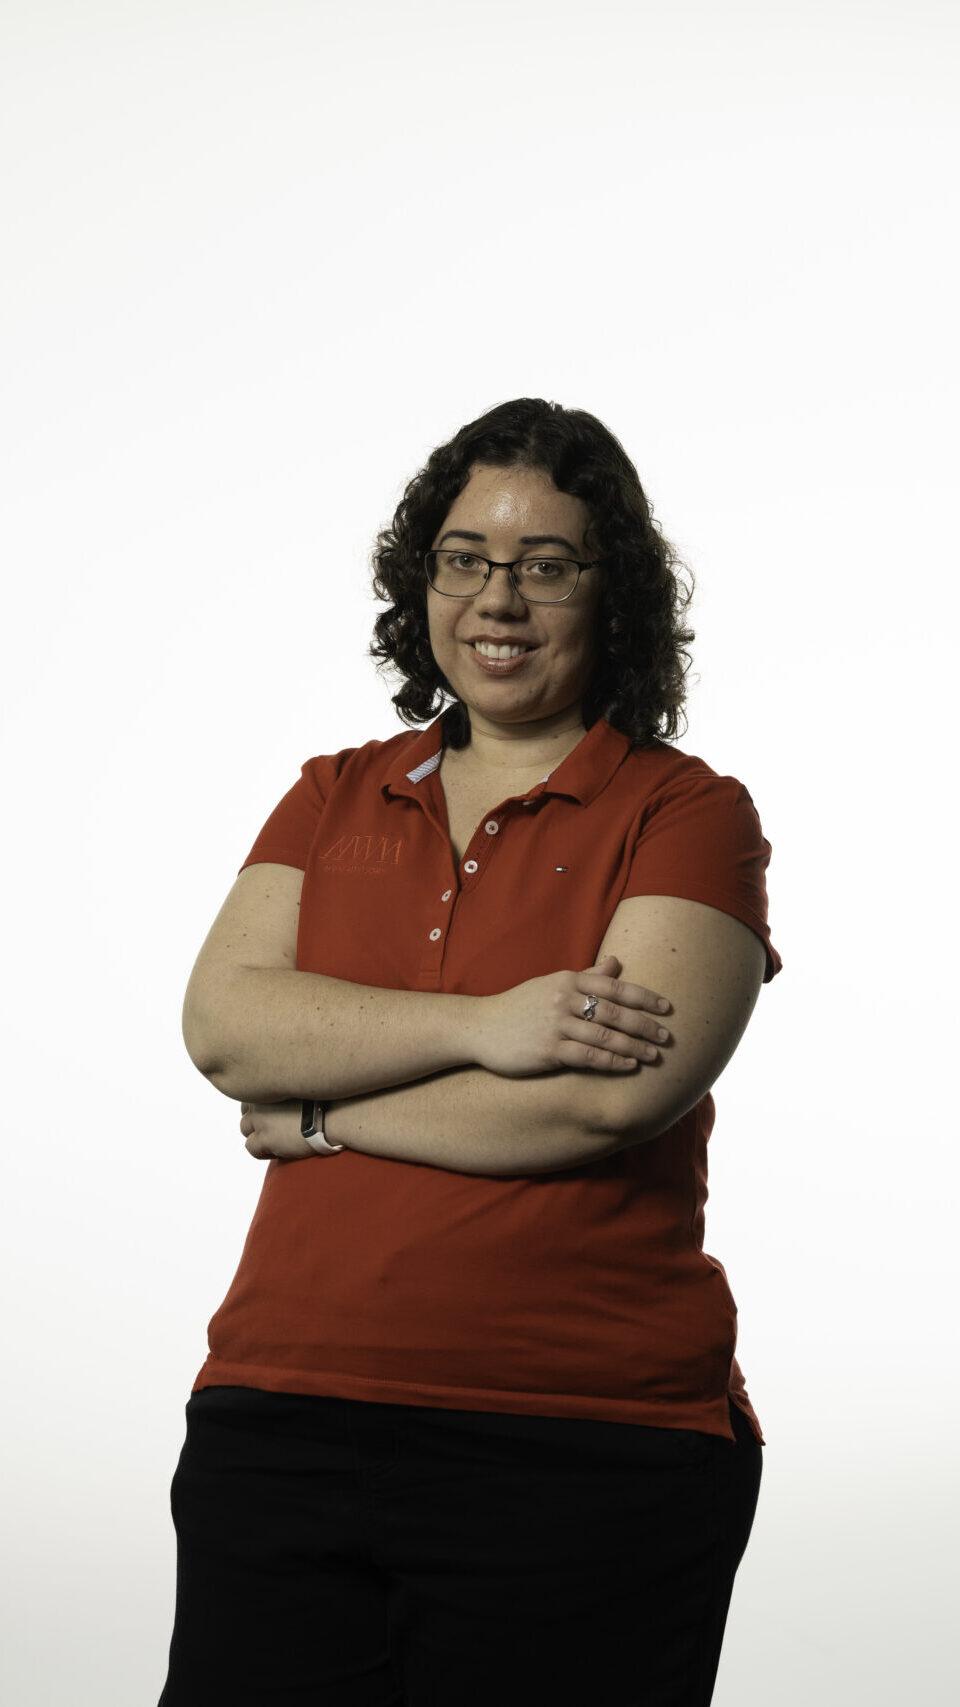 Jessica Outeiro